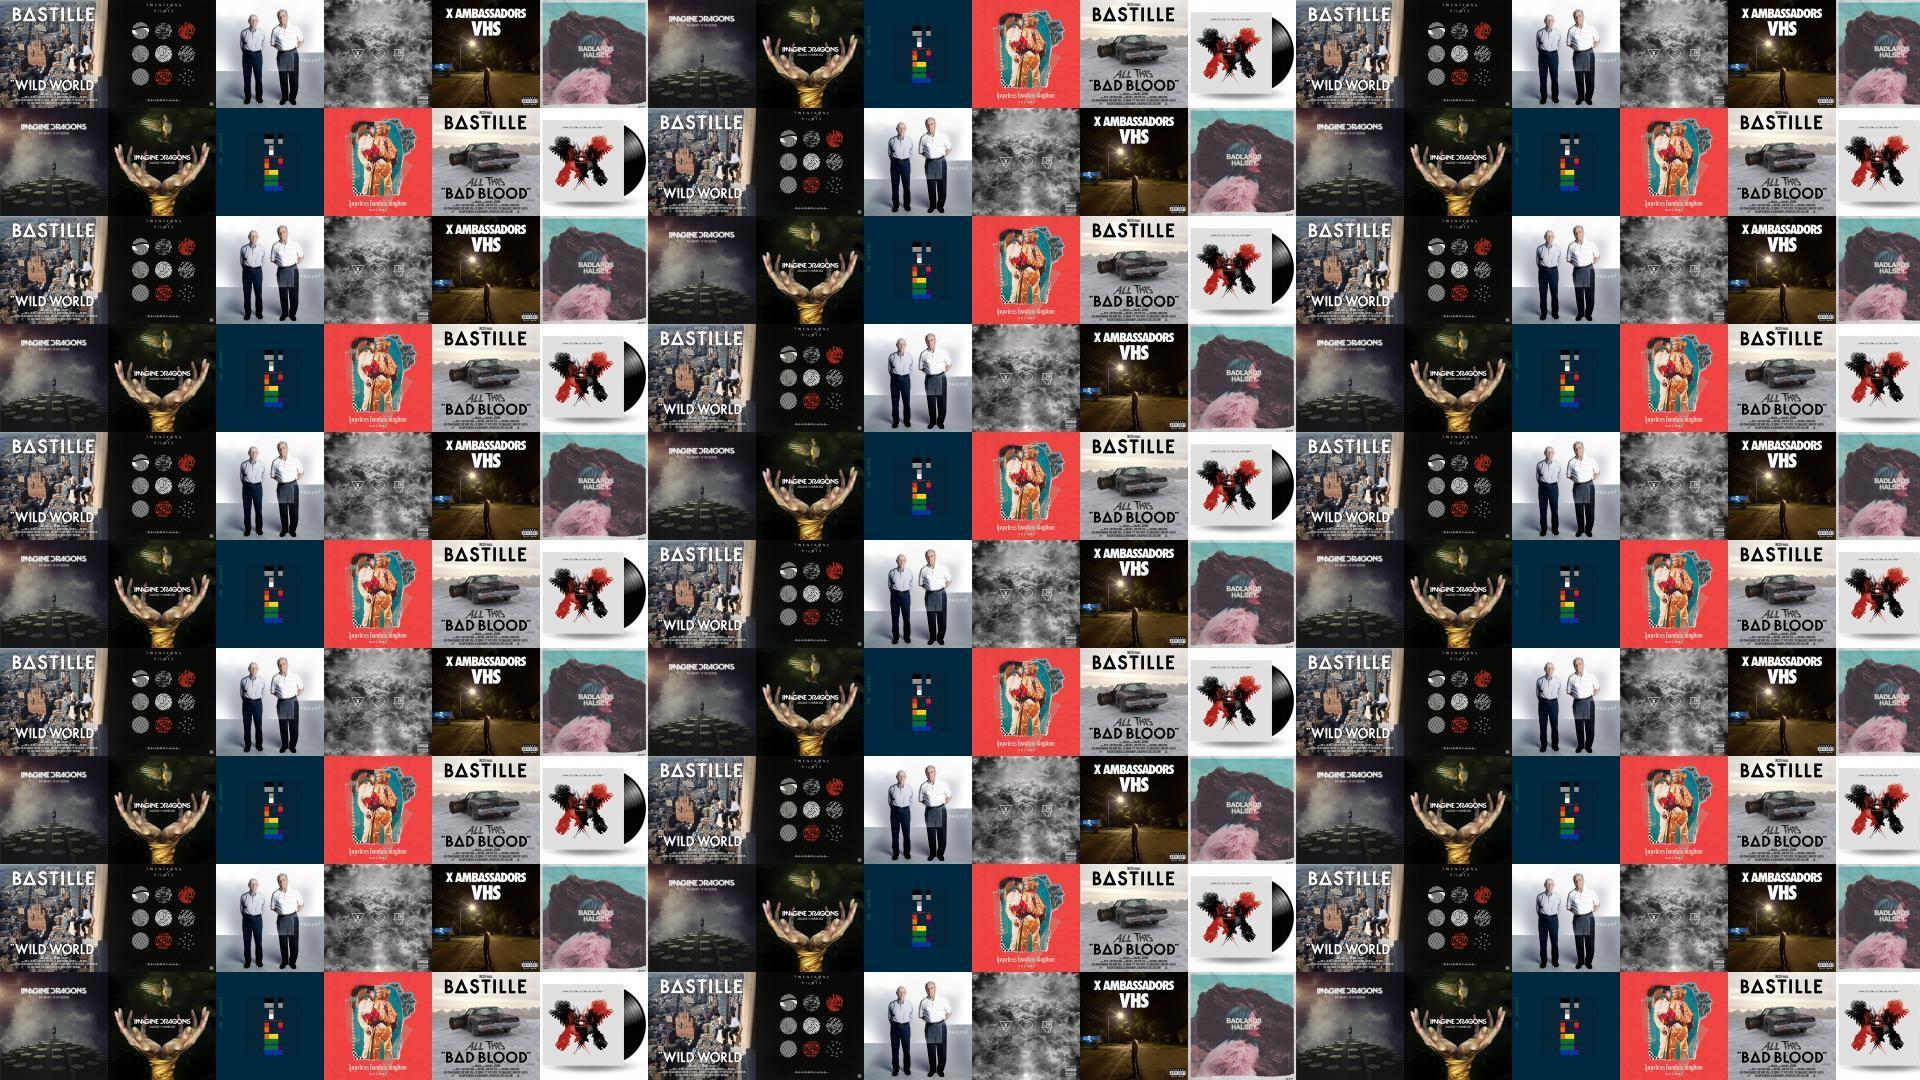 Fall Out Boy Wallpaper Ipad Twenty One Pilots Desktop Wallpaper 183 ① Download Free